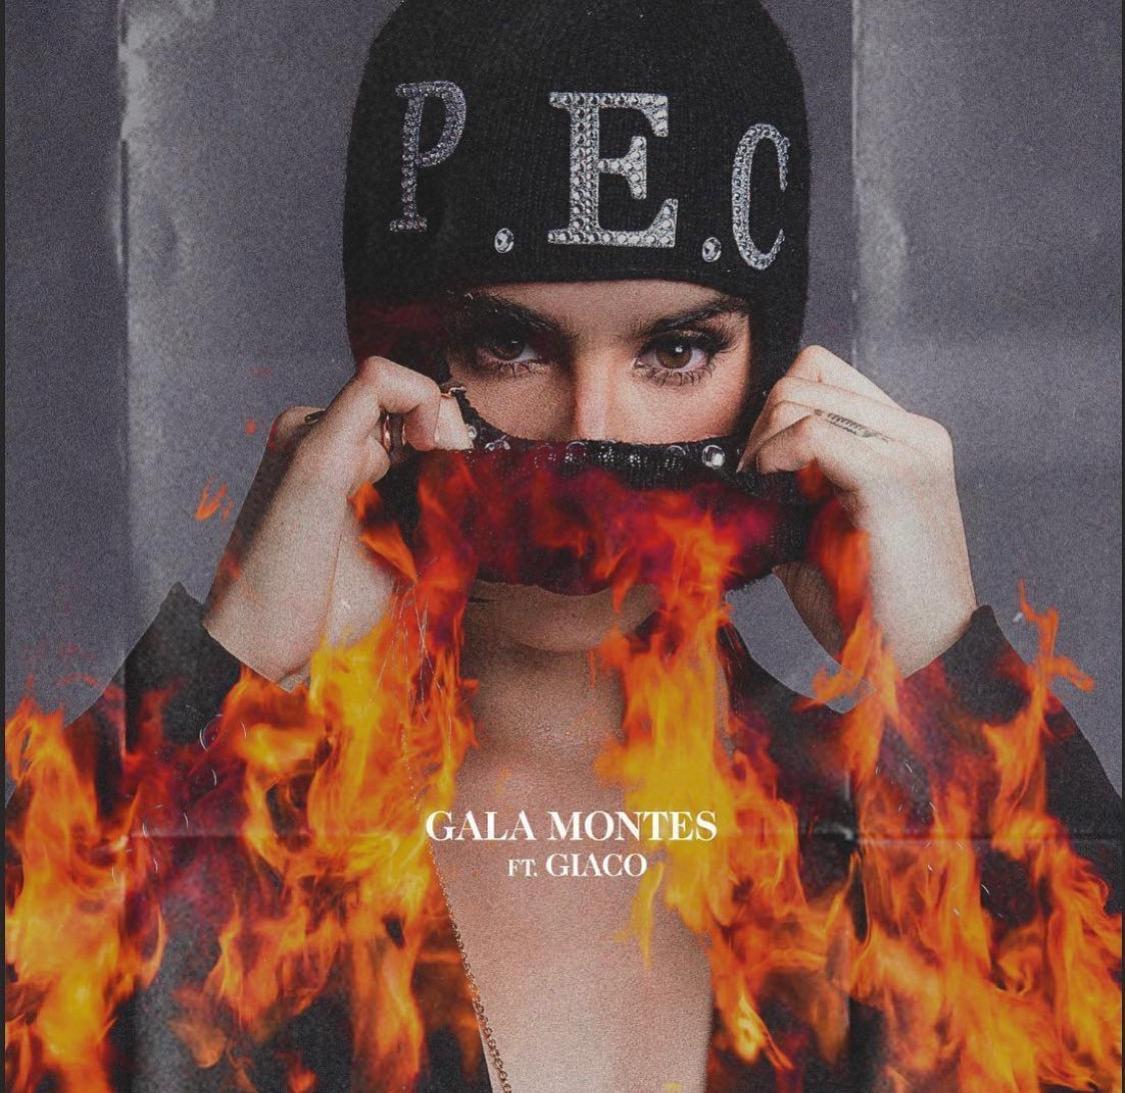 Gala Montes